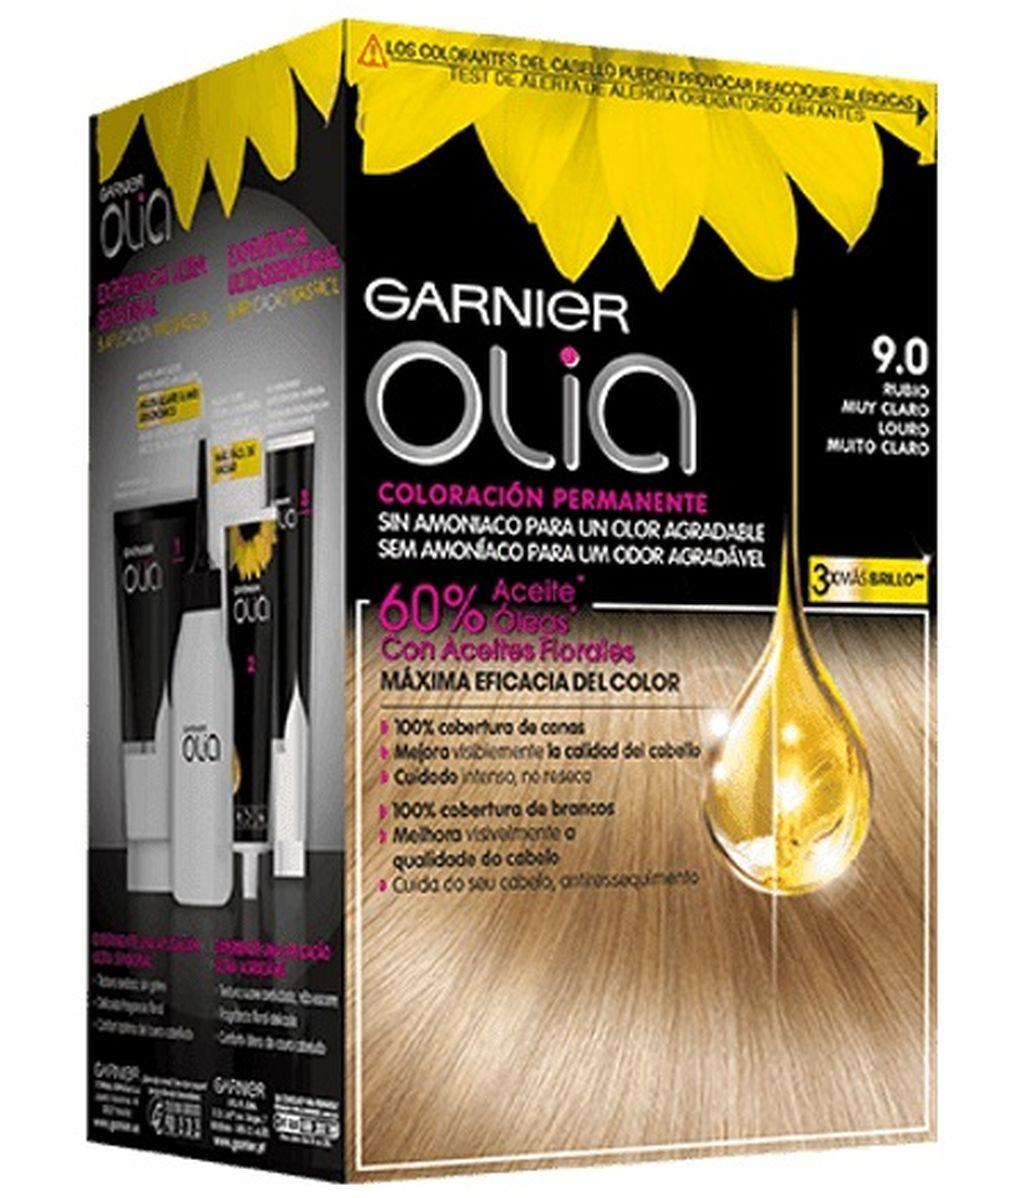 OLIA-GARNIER